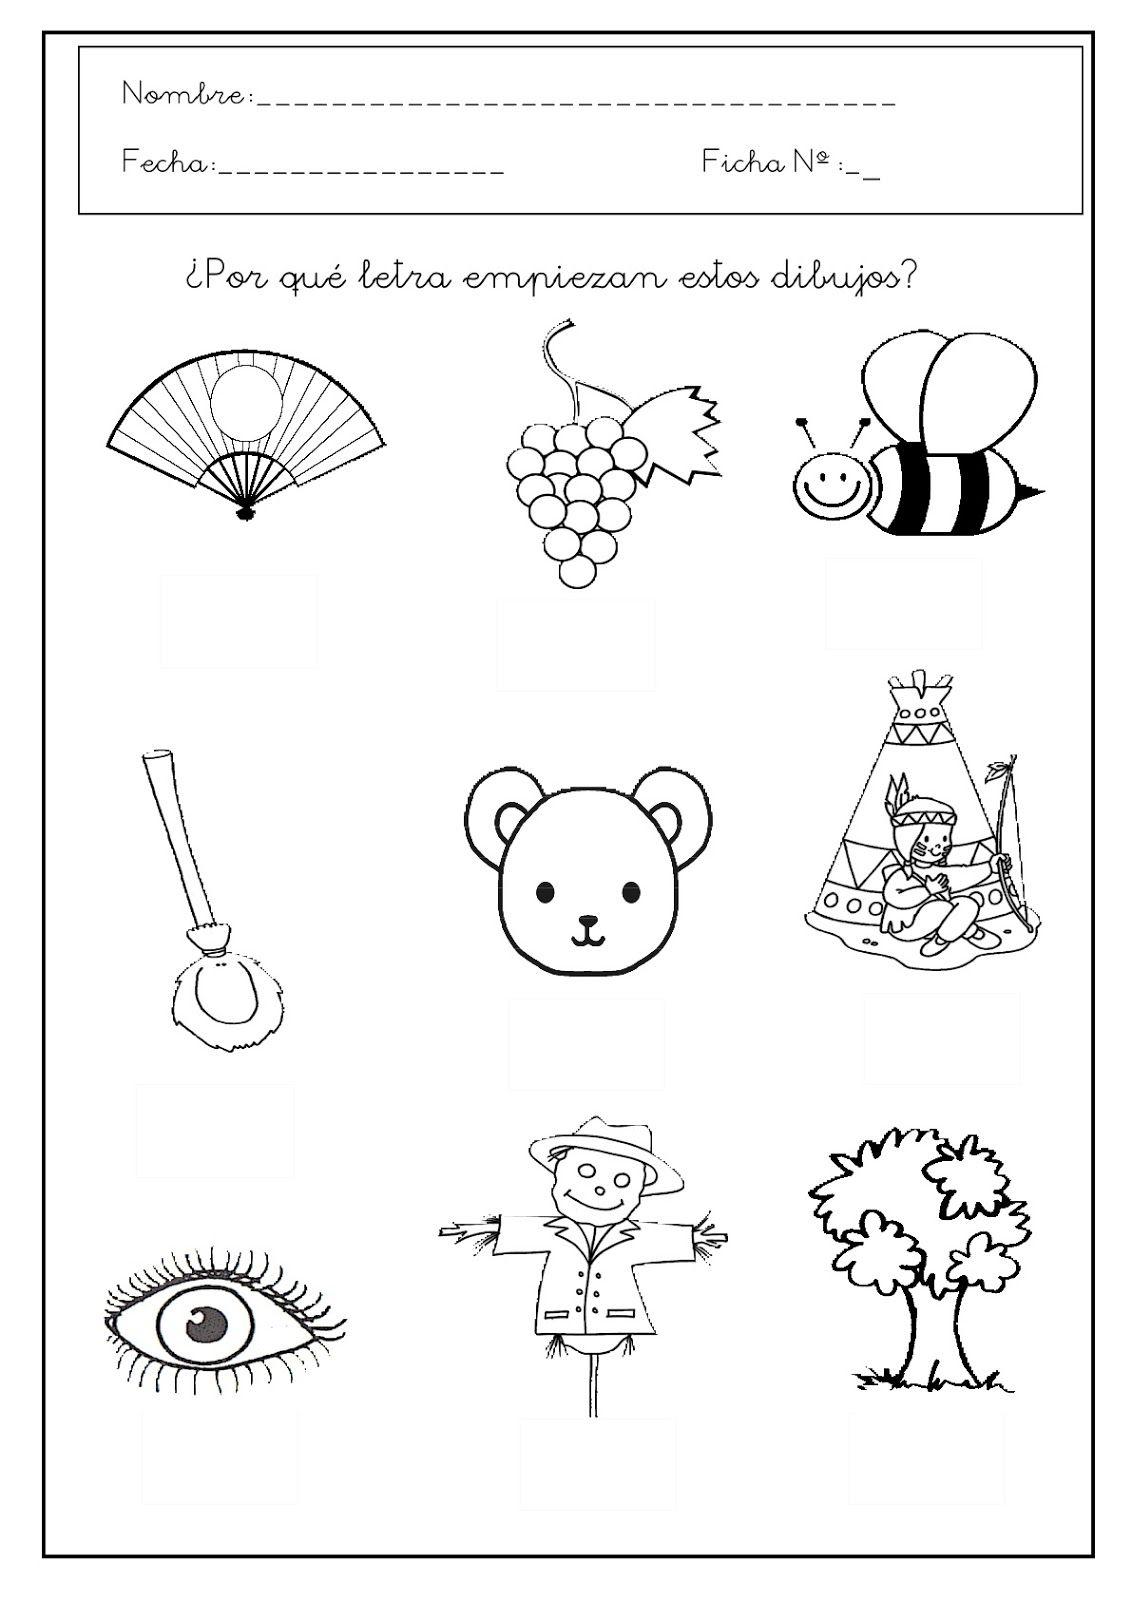 Pin de manu fruchier en lectoescritura | Pinterest | Actividades ...